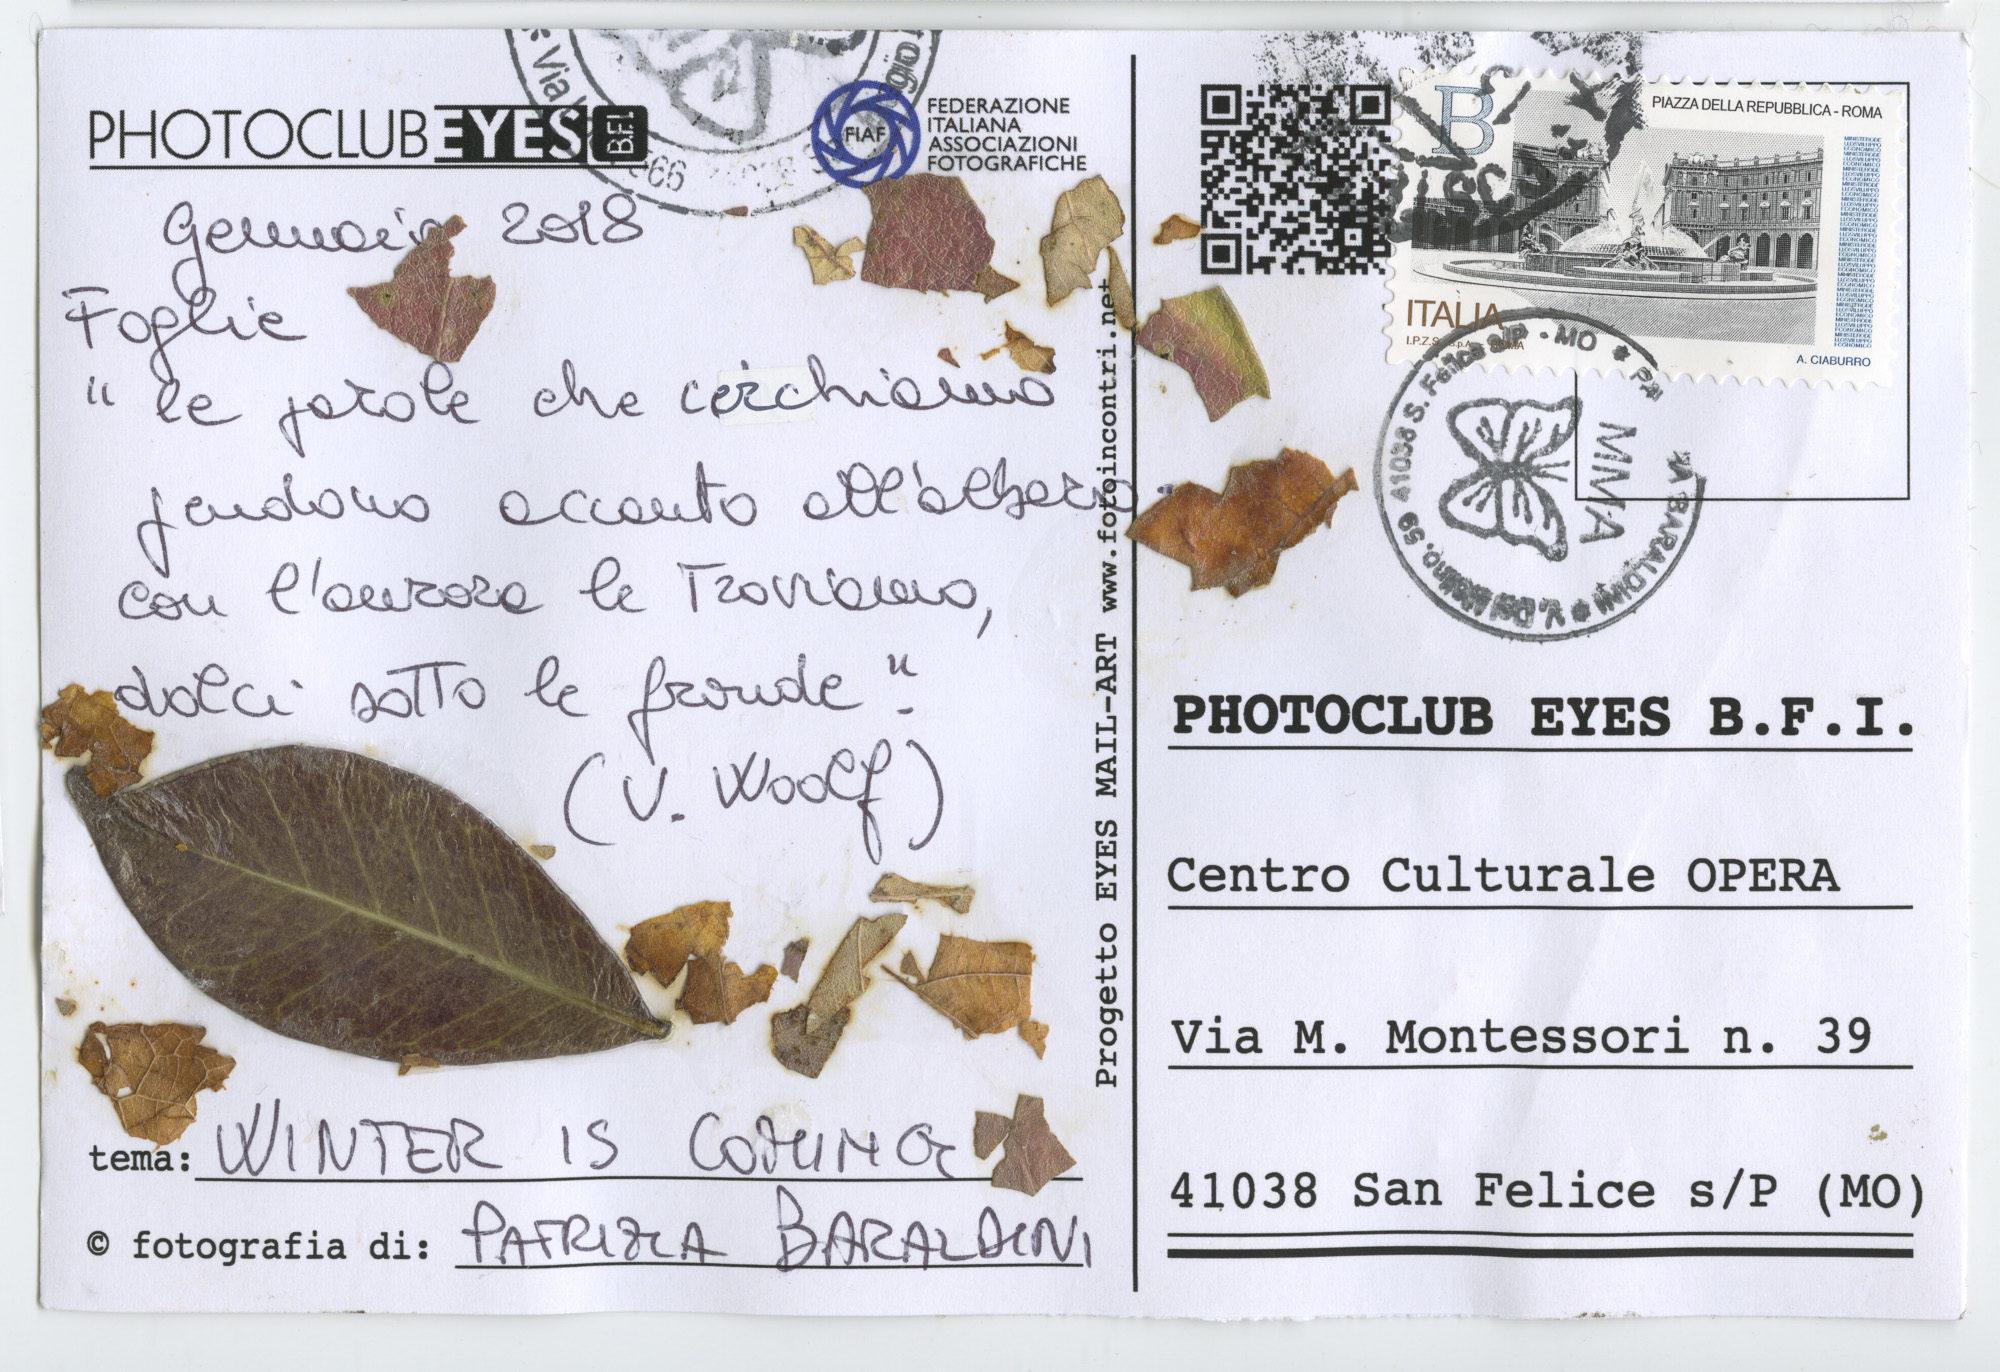 Patrizia Balardini